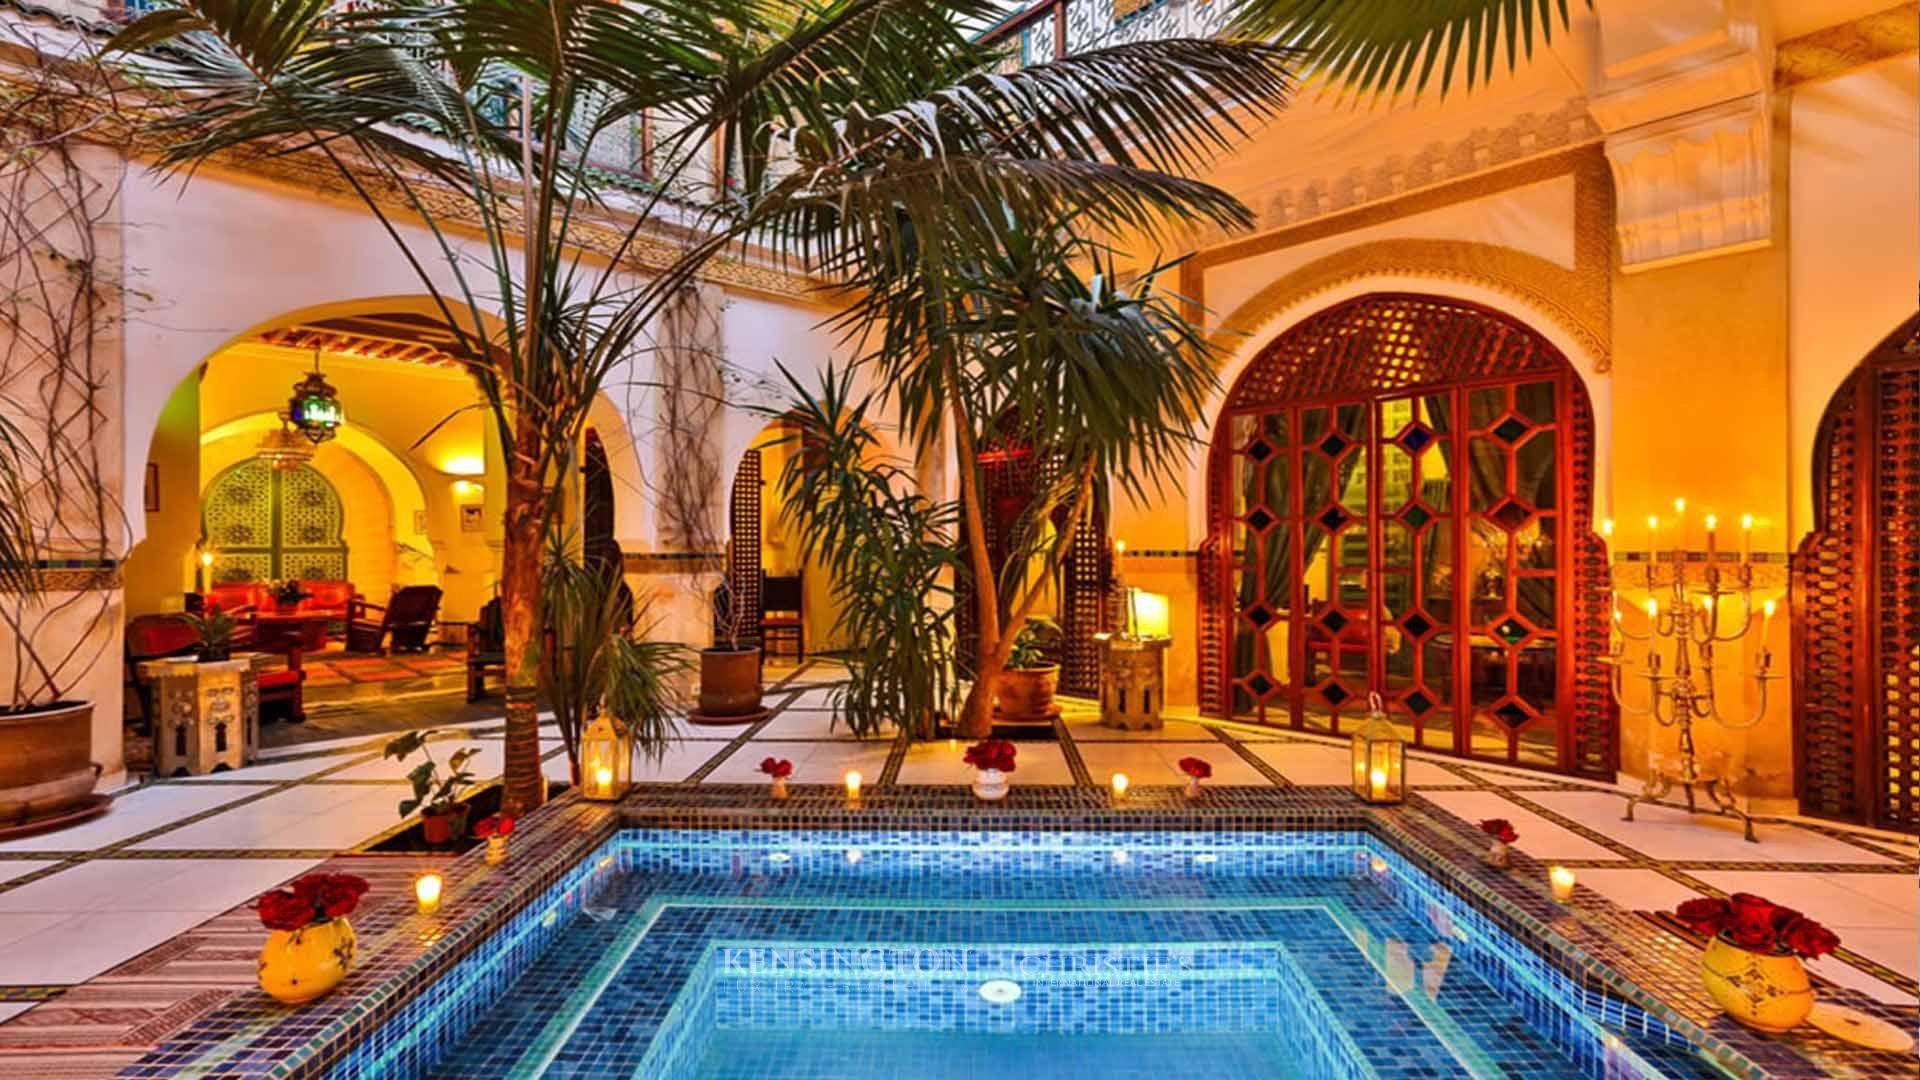 KPPM01260: Riad Moucha Riad Marrakech Morocco